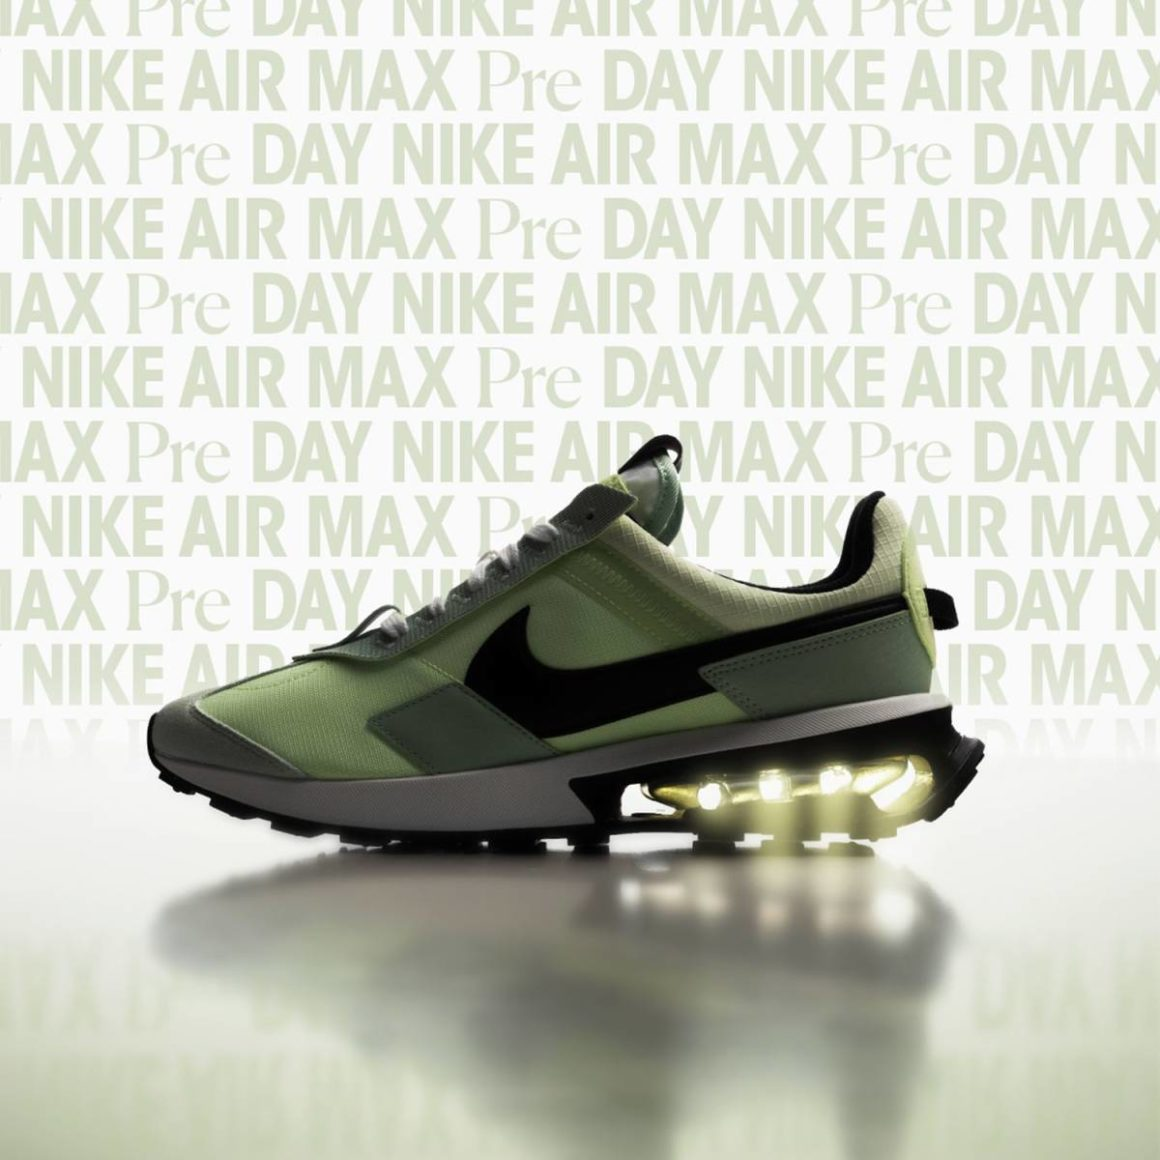 nike-nike-air-max-pre-day-dd0338-300-sommer-sneaker-trends-2021-herren